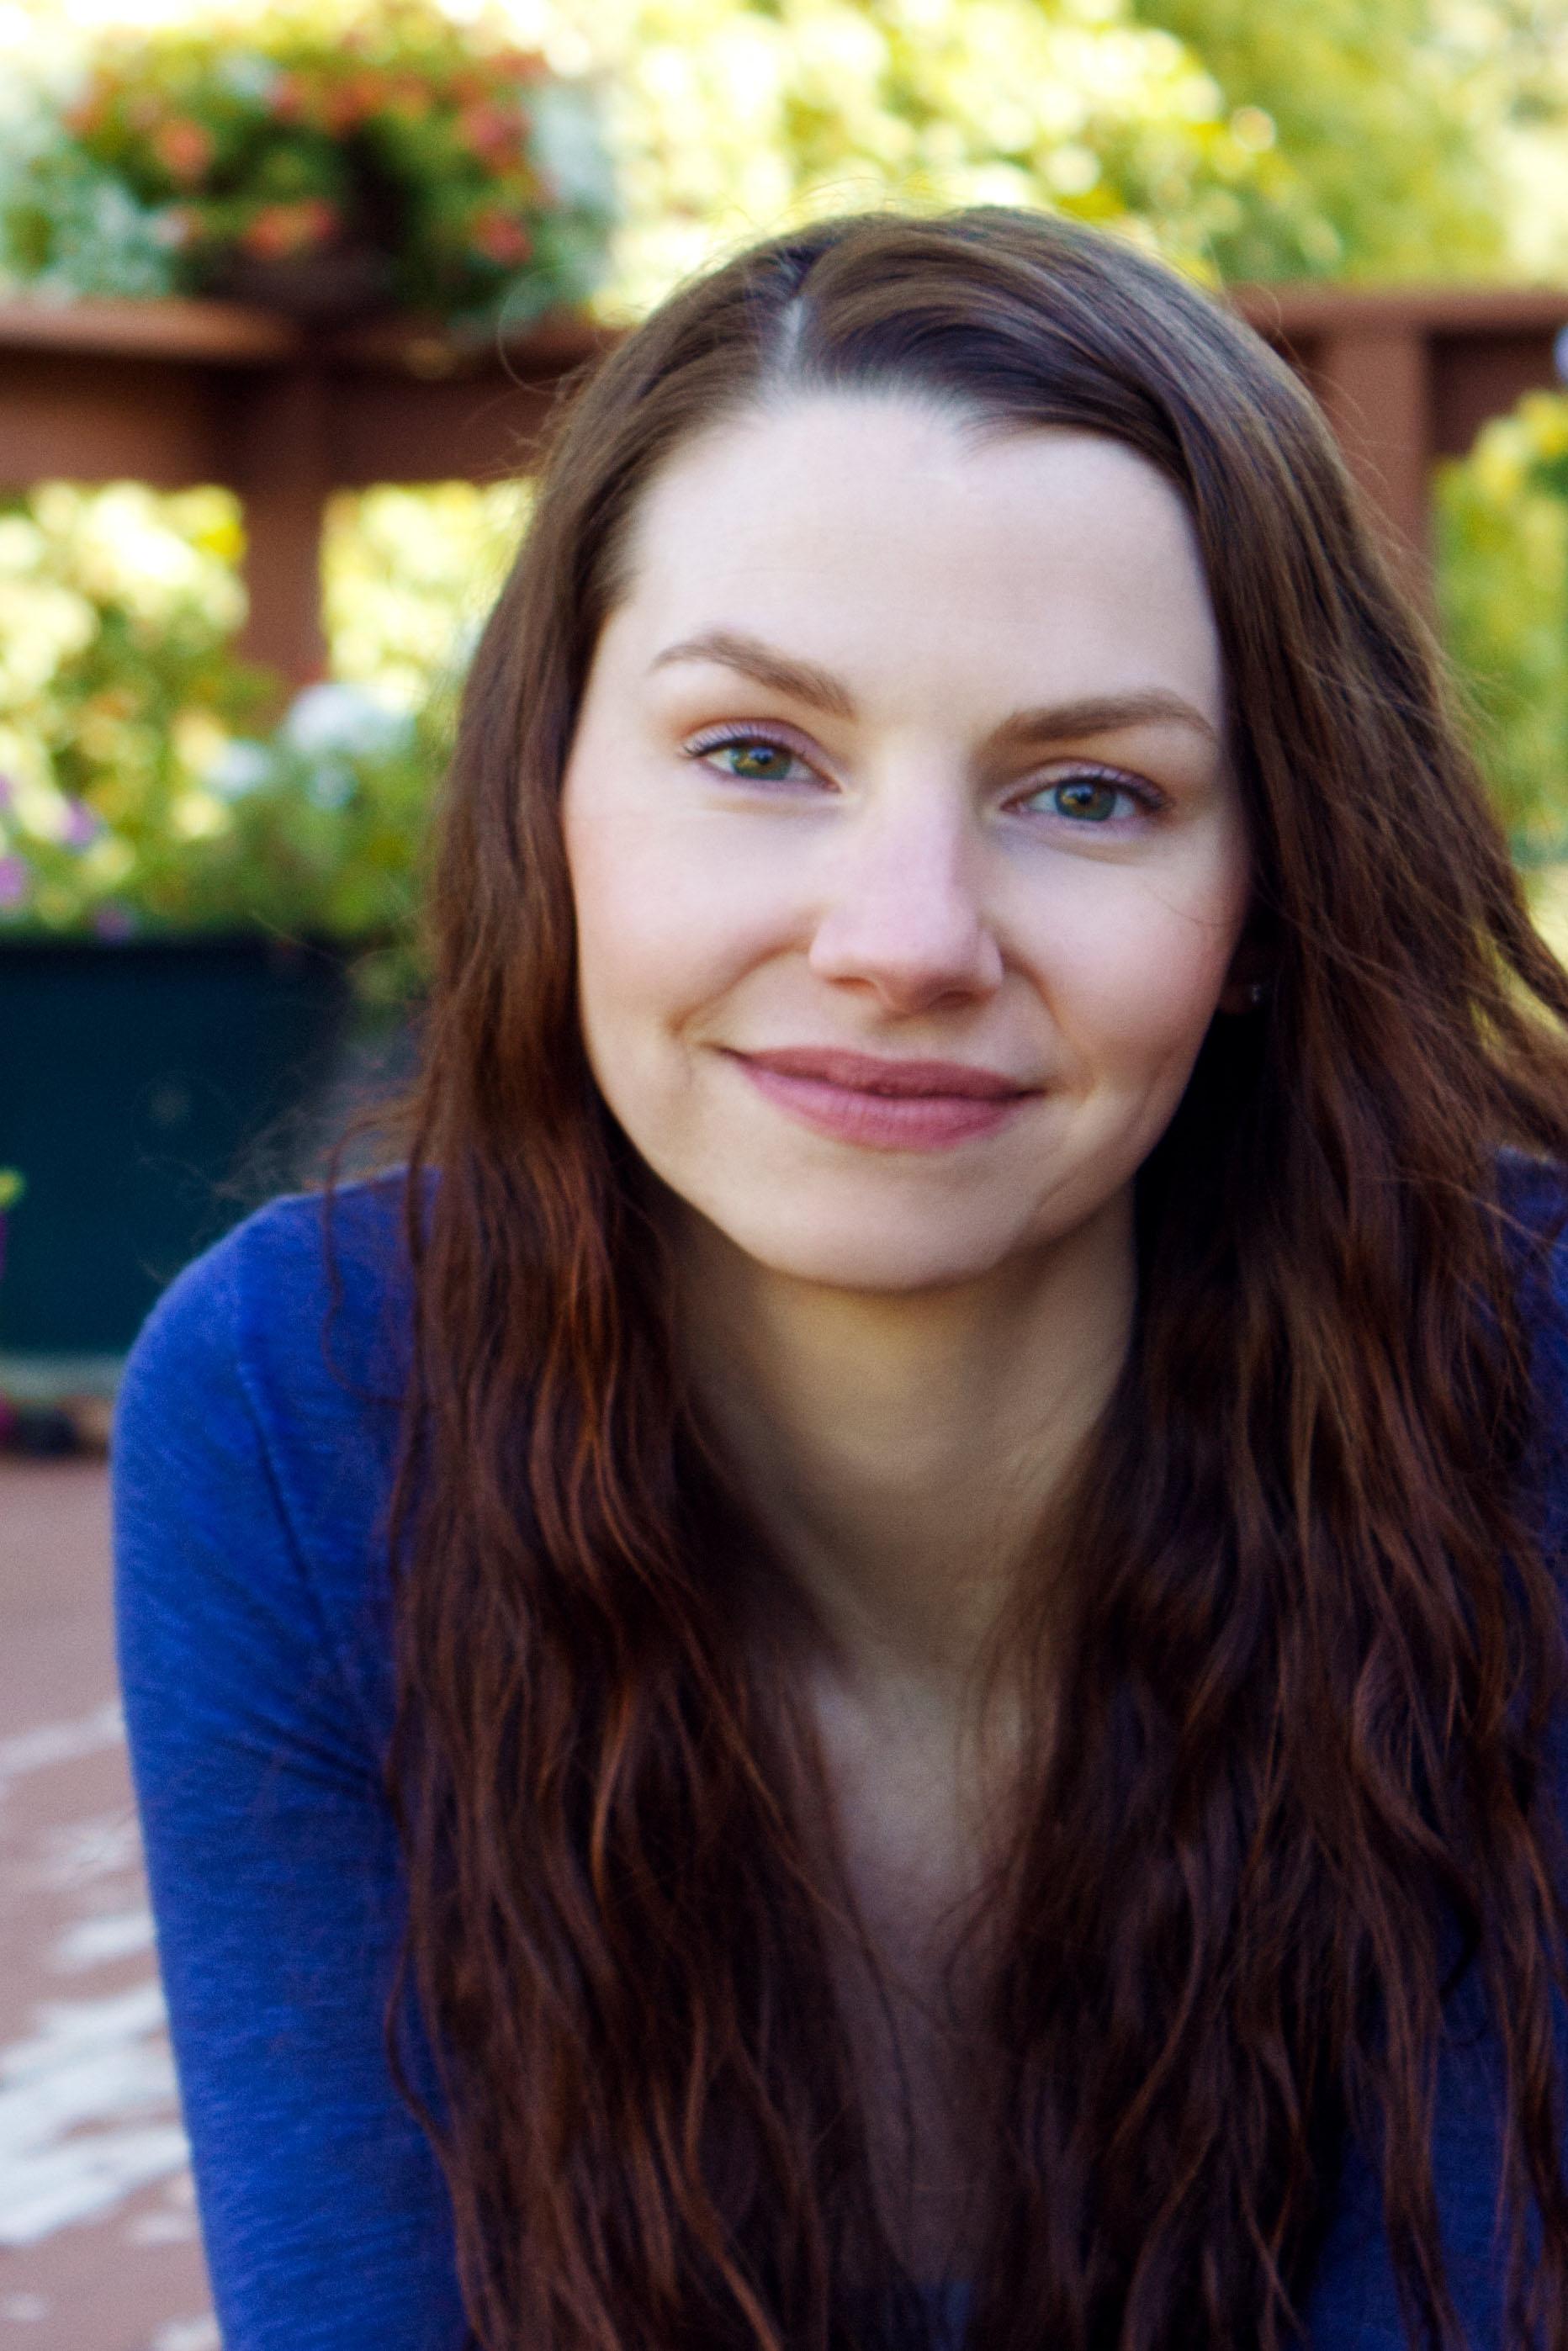 Jenny Meier portrait photo